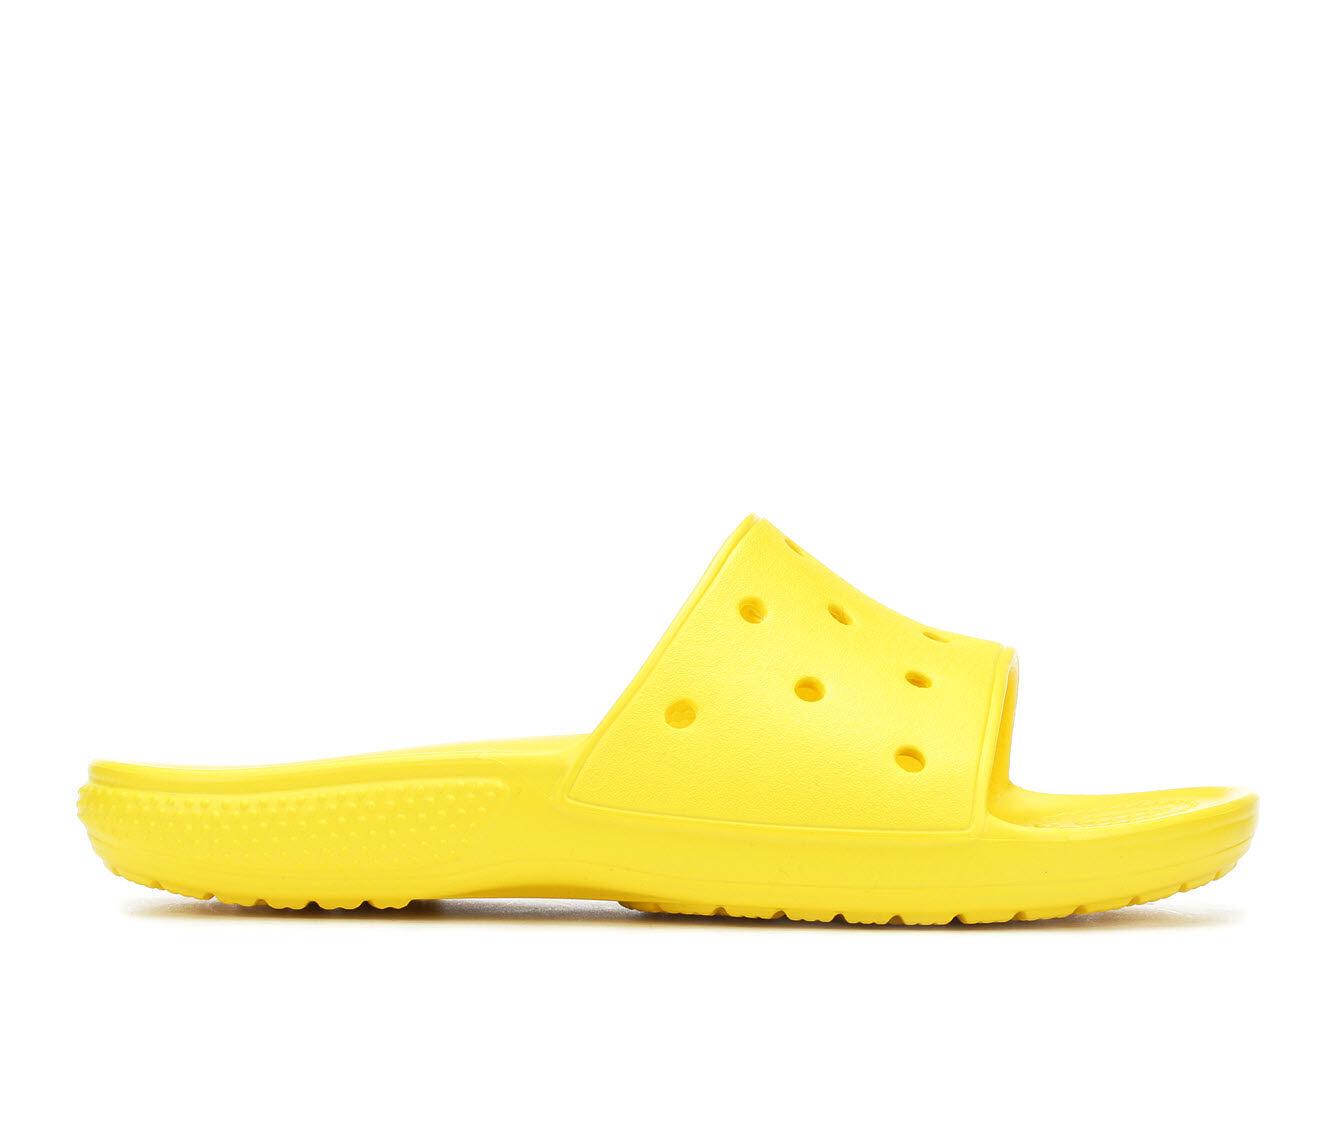 Crocs Flash Sale